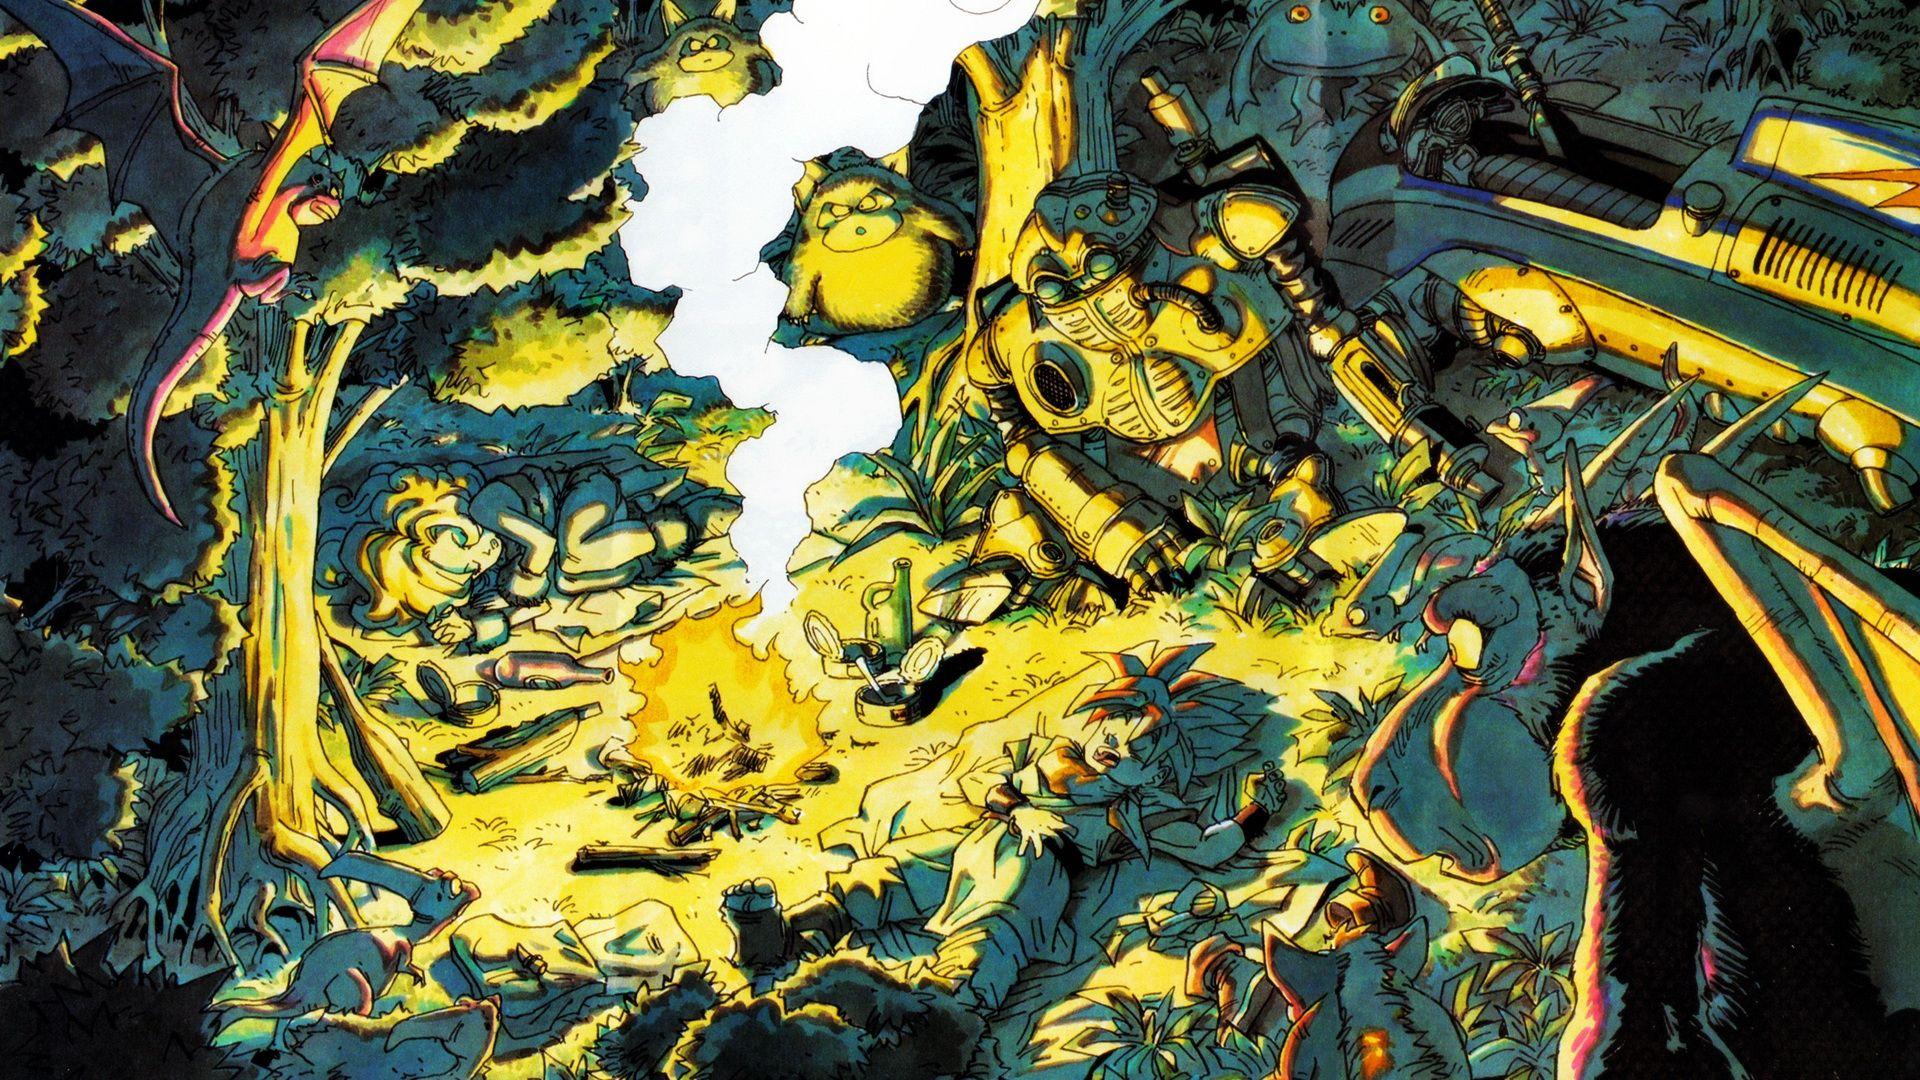 Chrono Trigger Wallpaper 1920x1080 Retro Games Wallpaper